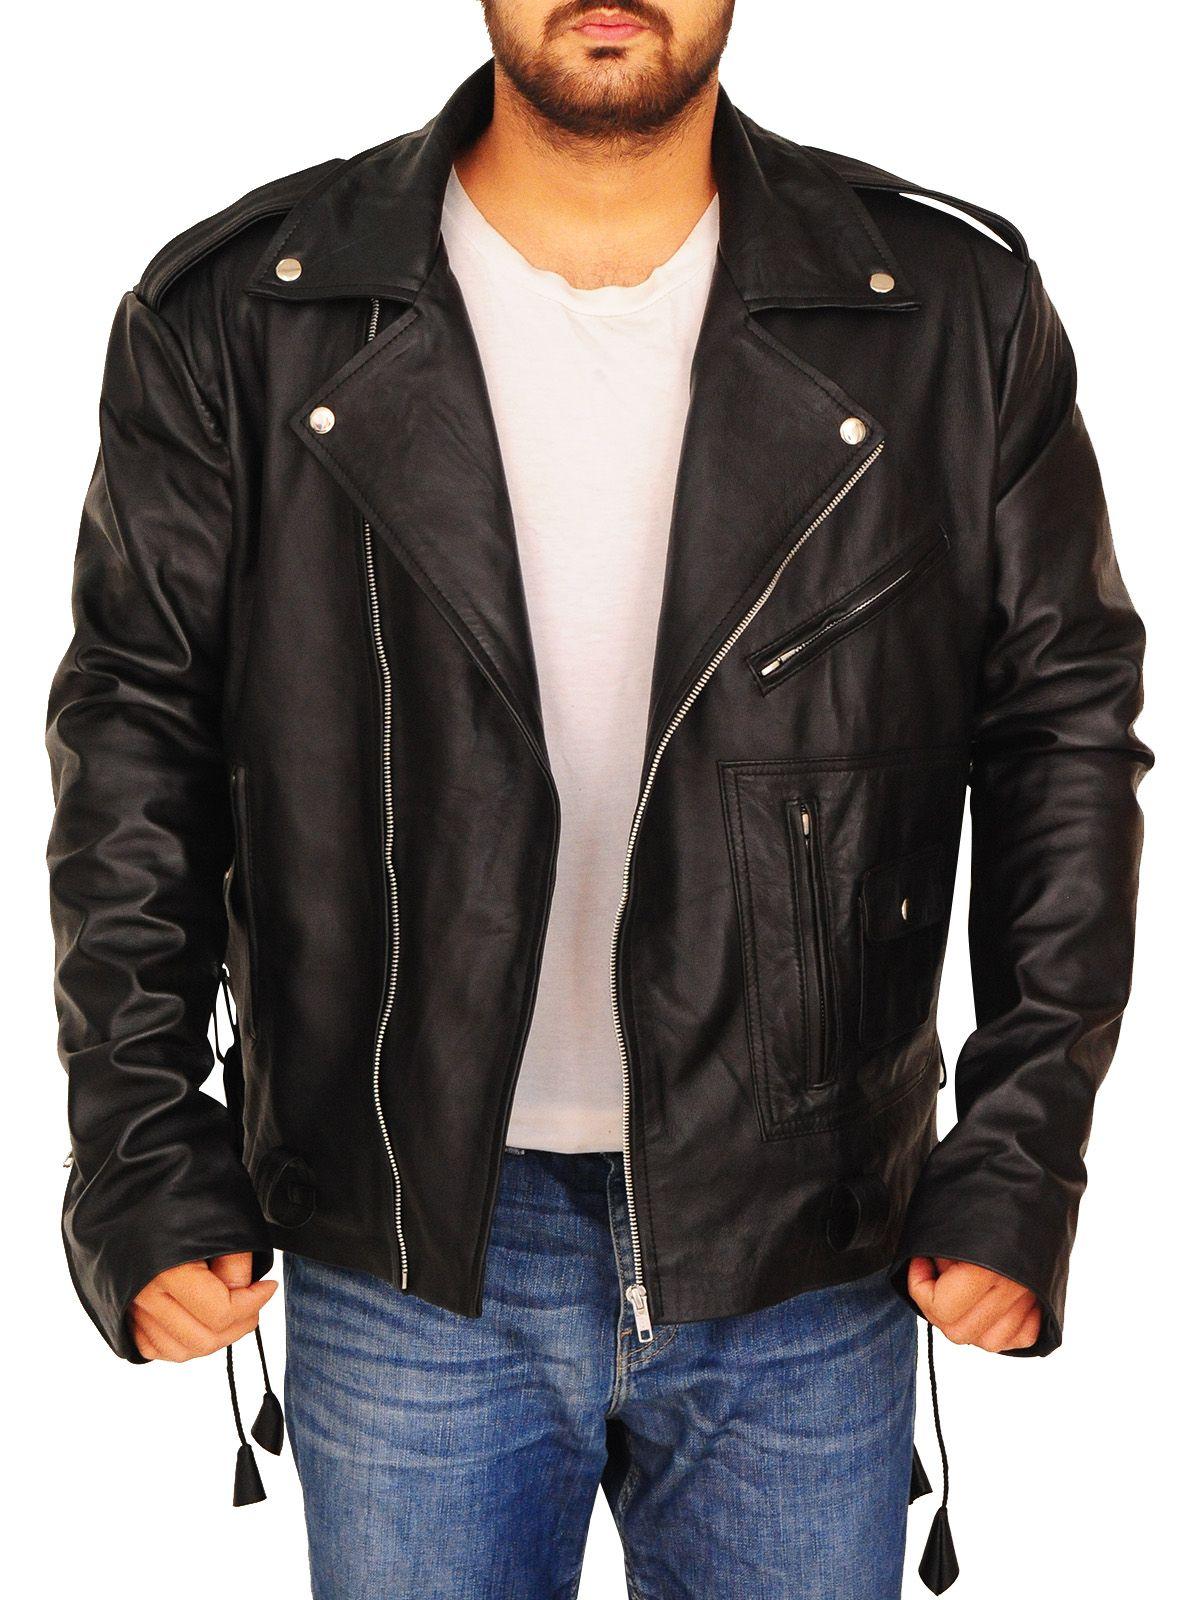 Black Waist Belted Leather Jacket Black Waist Belt Jackets Leather Jacket [ 1600 x 1200 Pixel ]